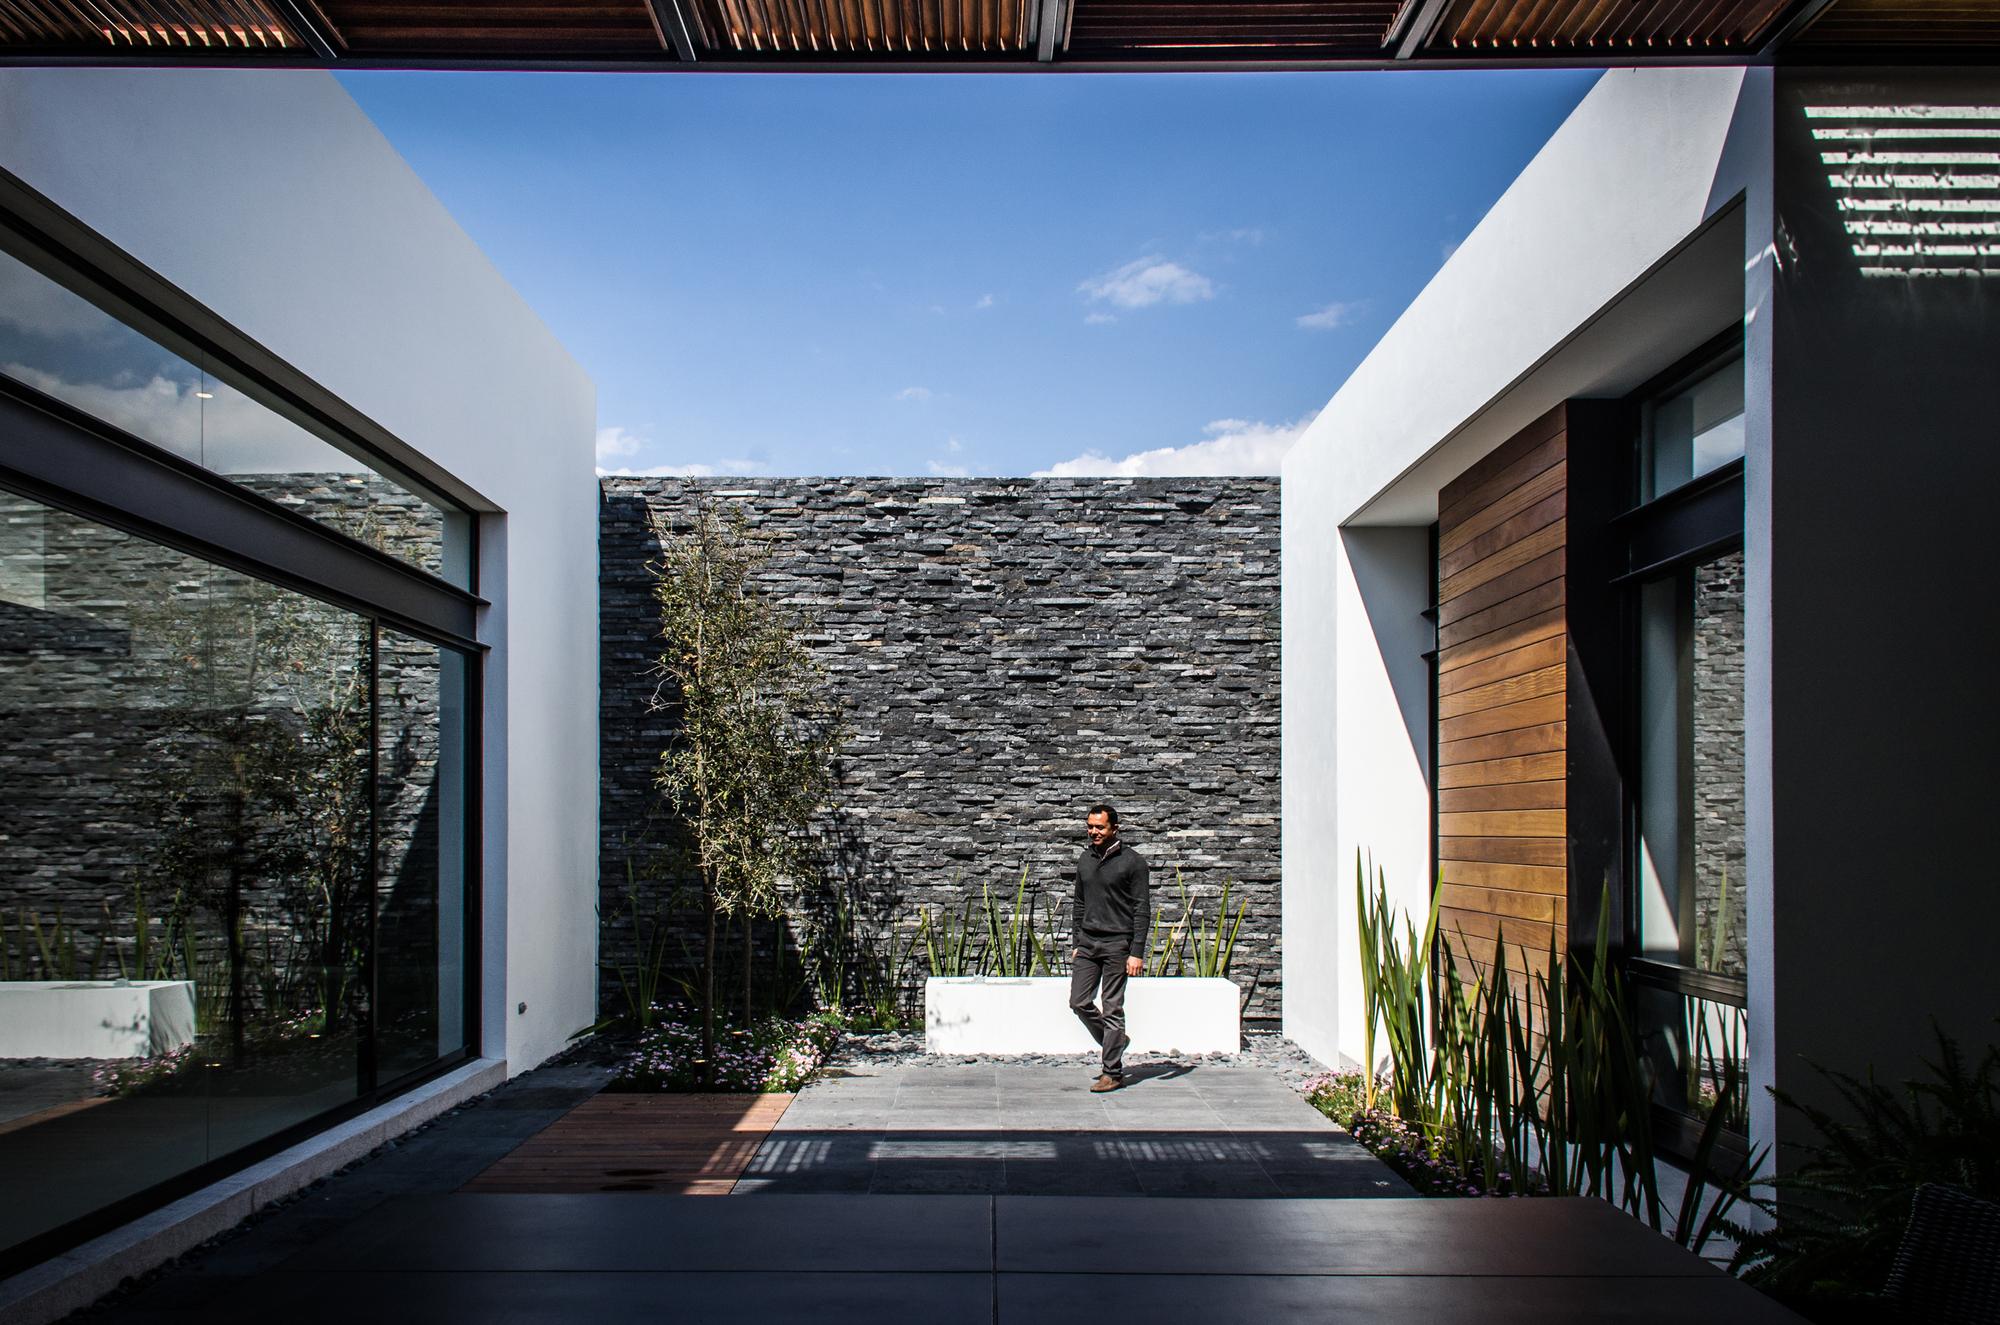 Casa agr adi arquitectura y dise o interior archdaily for Arquitectura de interiores universidades